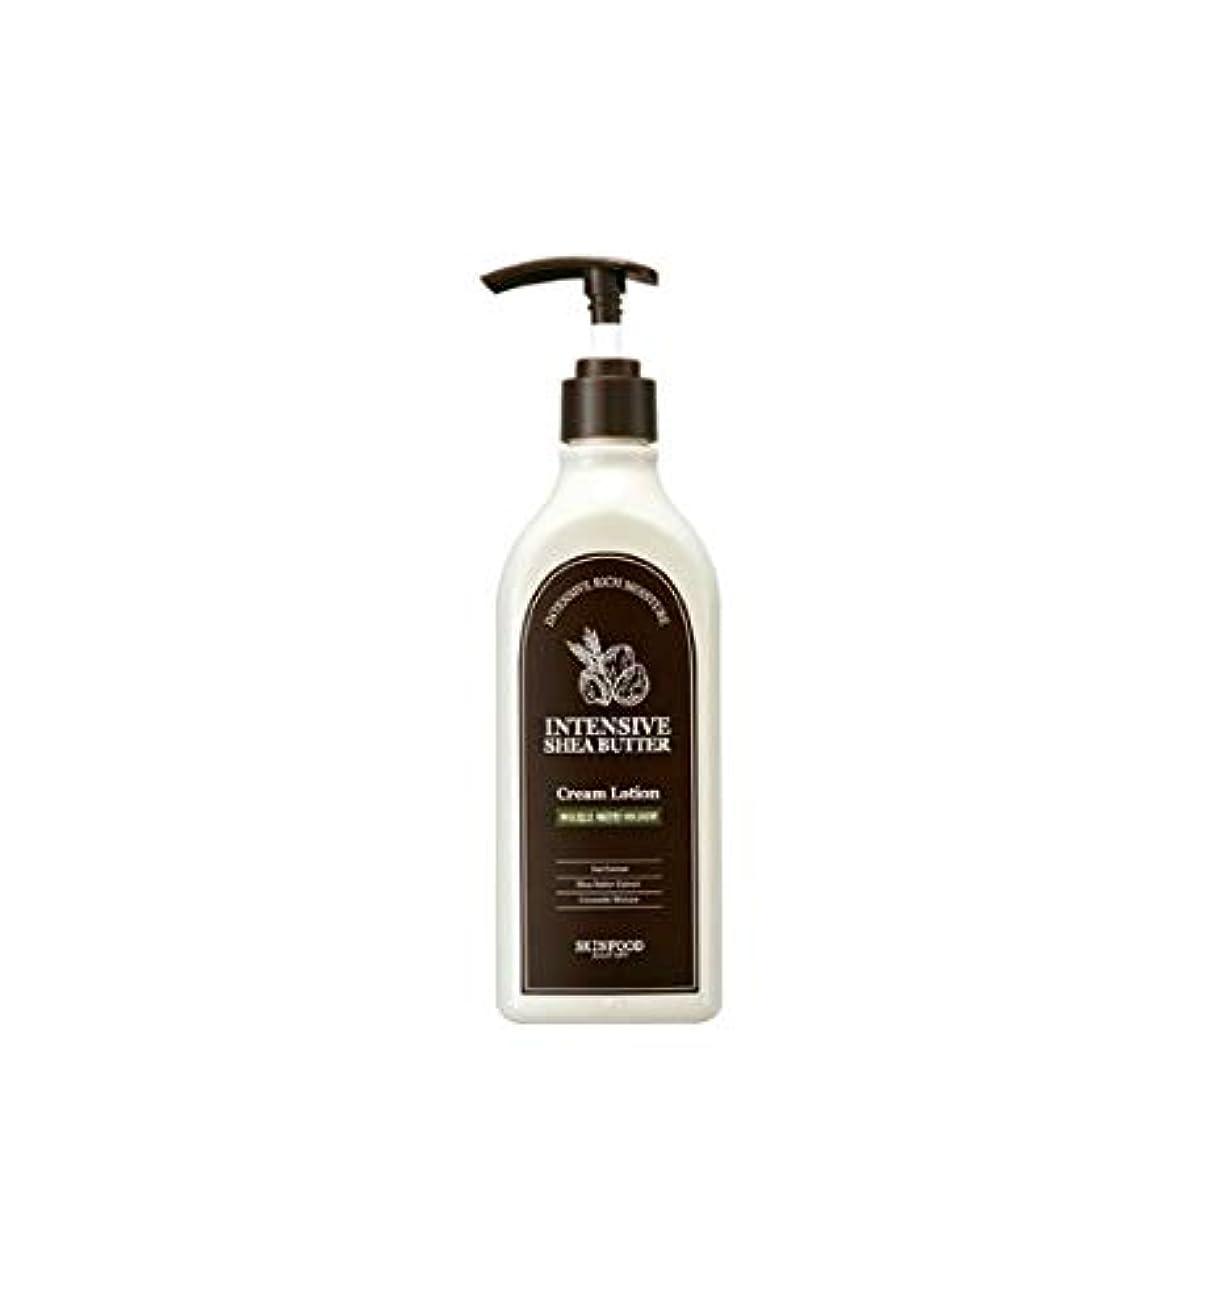 Skinfood 集中シアバタークリームローション/Intensive Shea Butter Cream Lotion 335ml [並行輸入品]